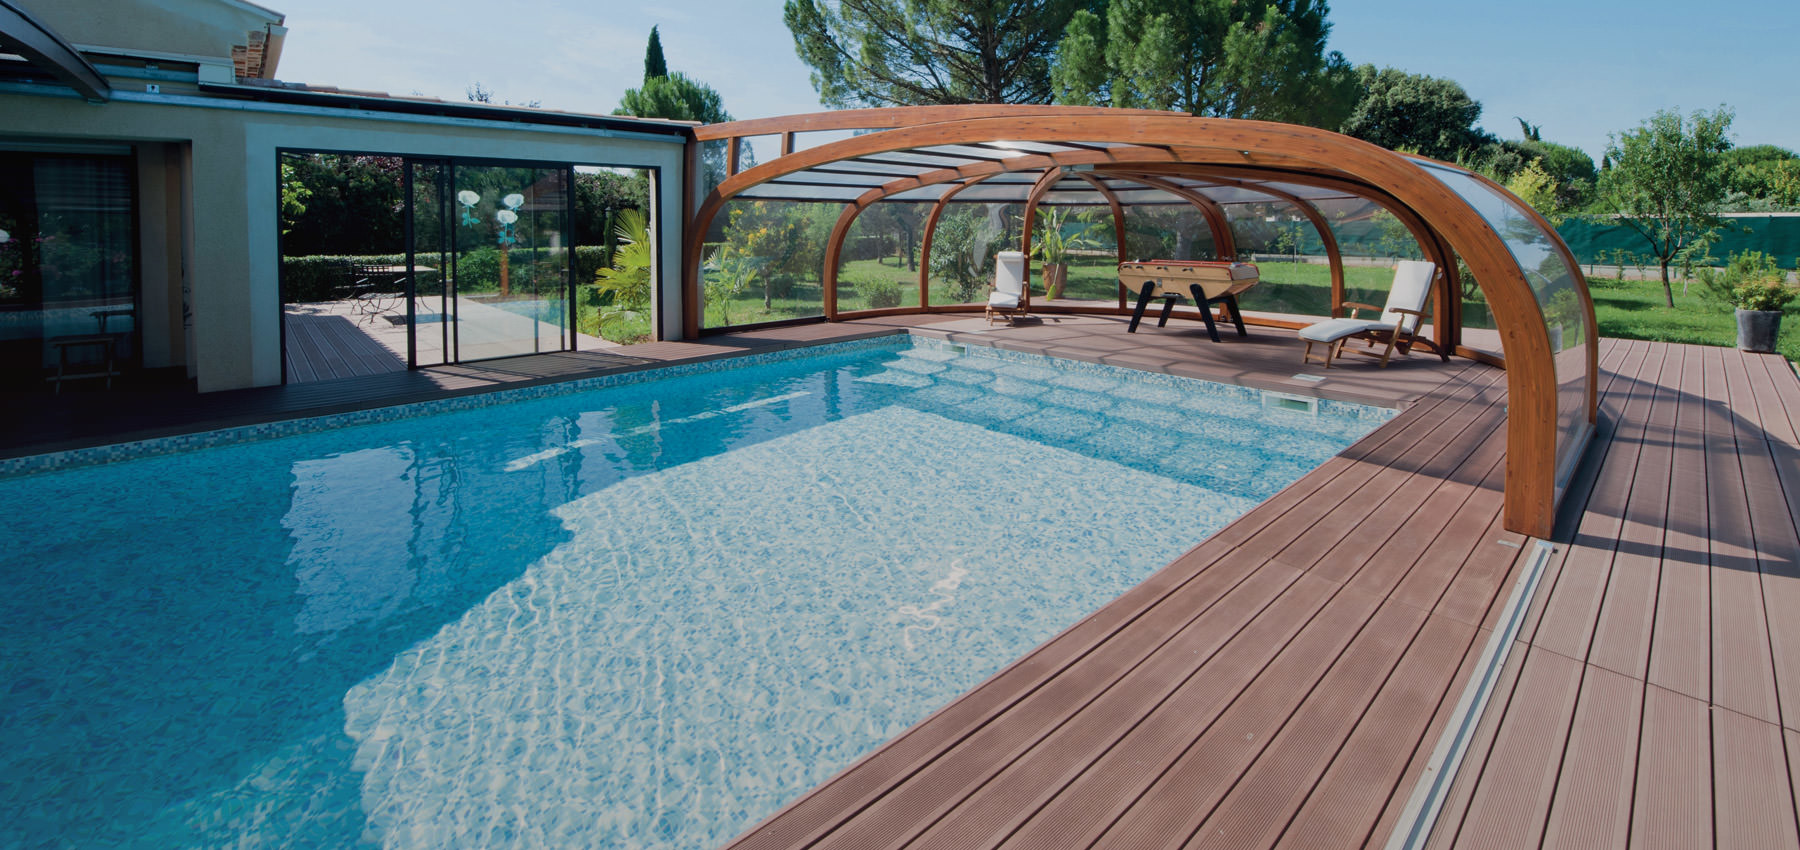 Abri piscine bois lamell coll good charpente de type for Abris piscine bois